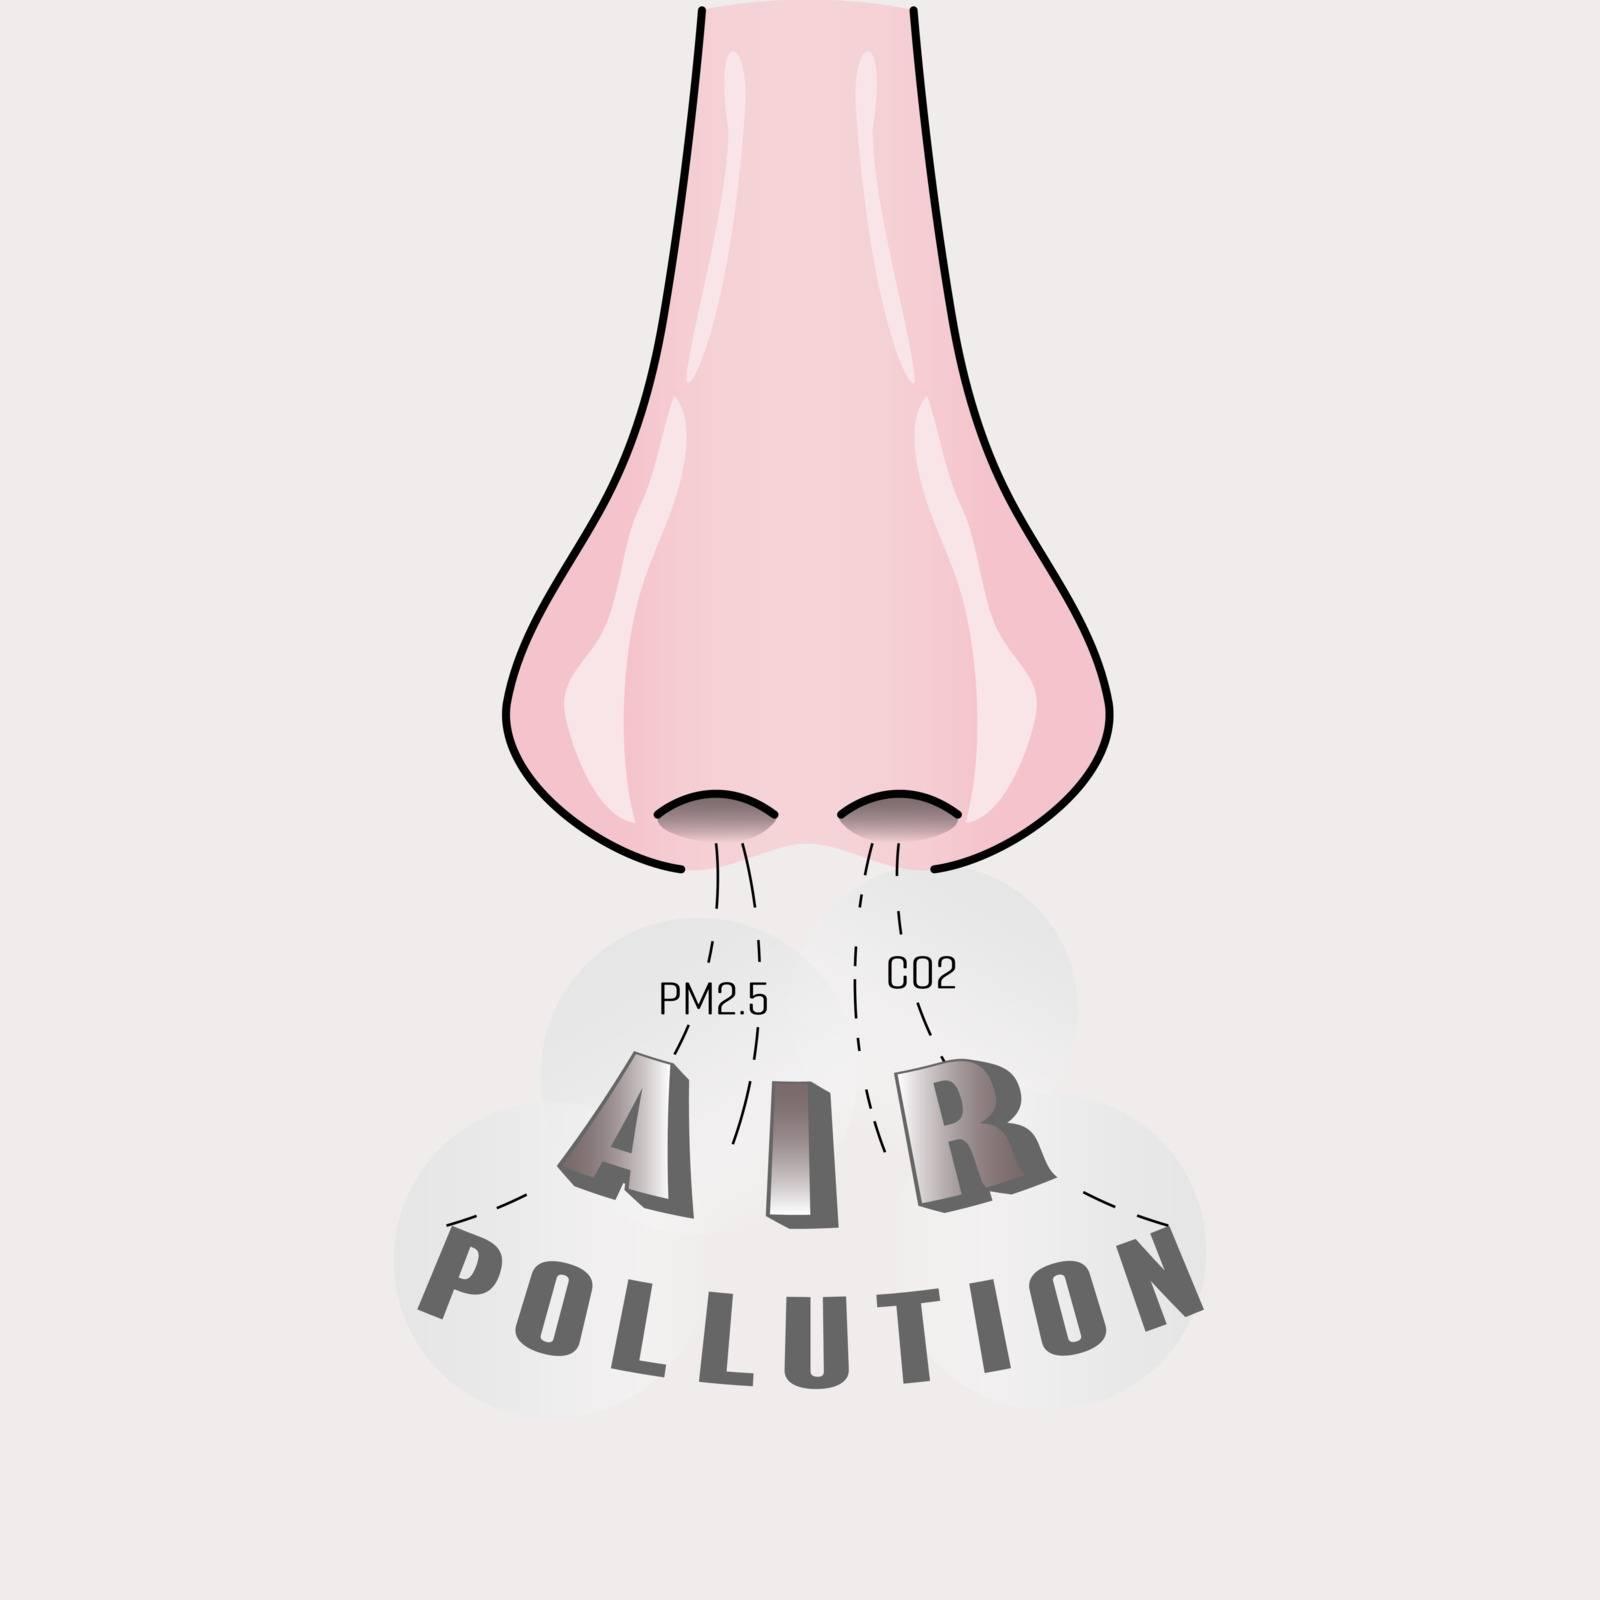 Human nose, inhalation of pollutants. Air pollution concept. Vector illustration outline flat design style.